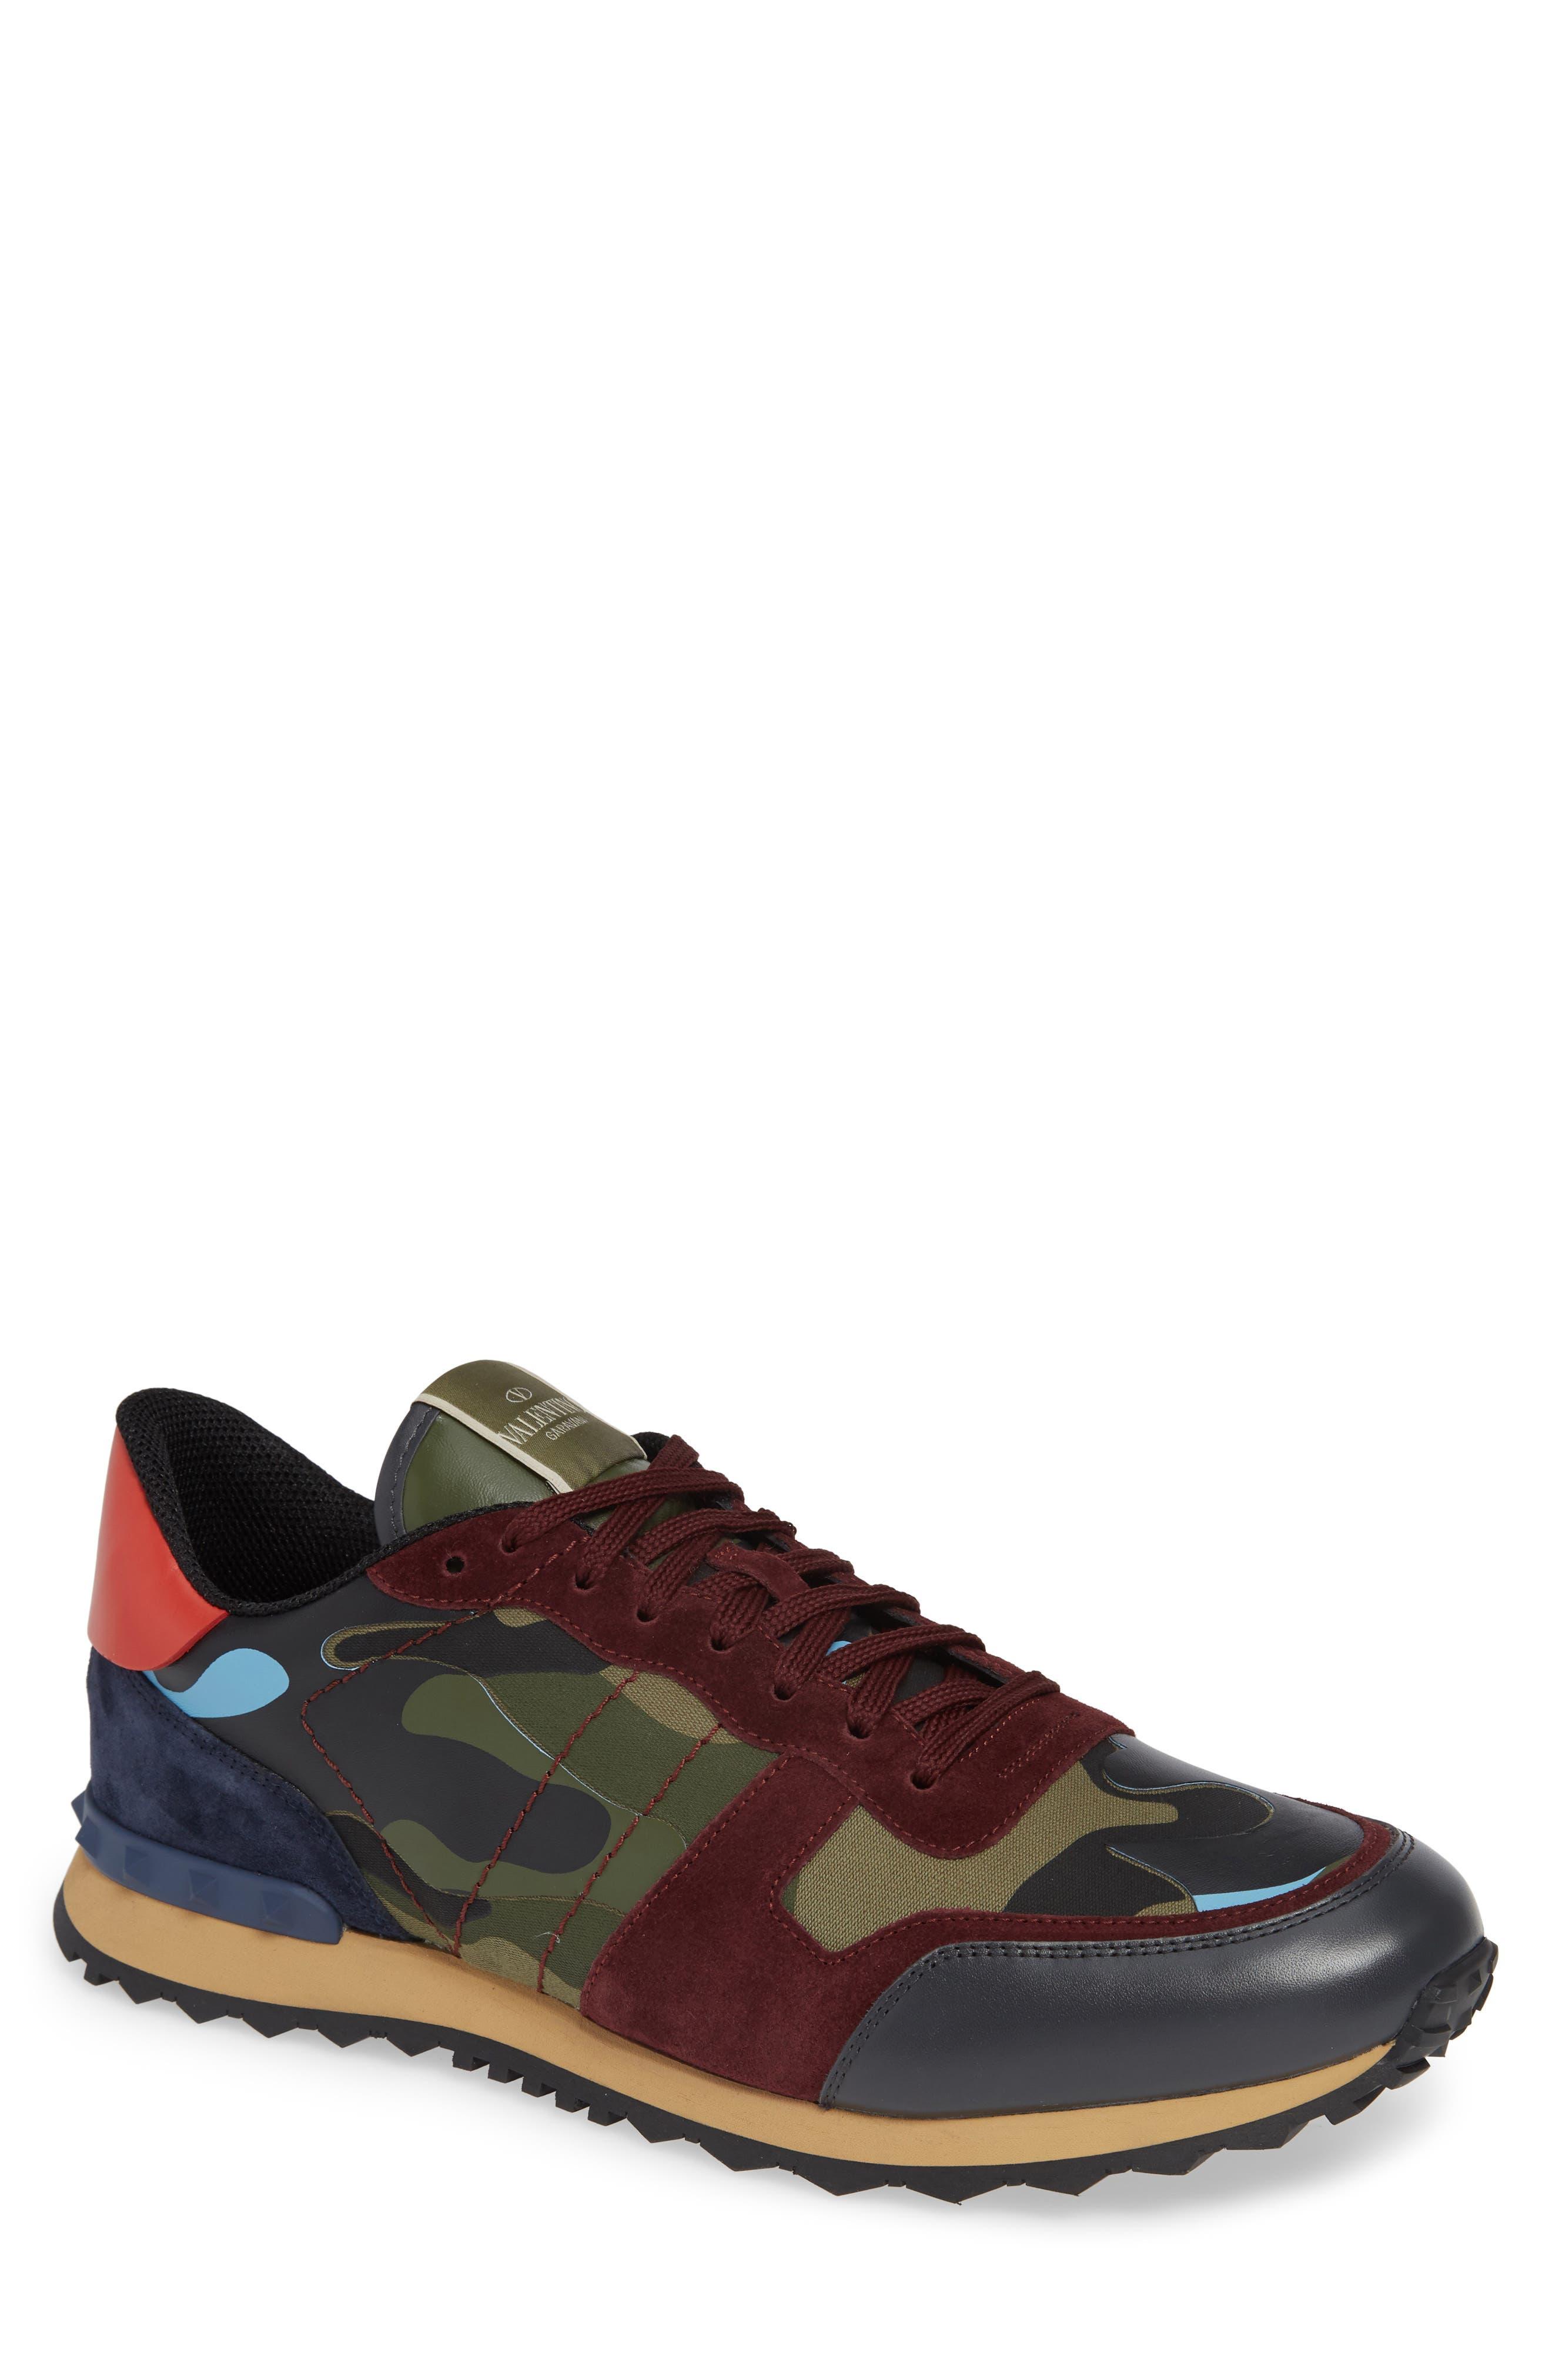 Camo Rockrunner Sneaker,                         Main,                         color, LIGHT BLUE/ BORDEAUX